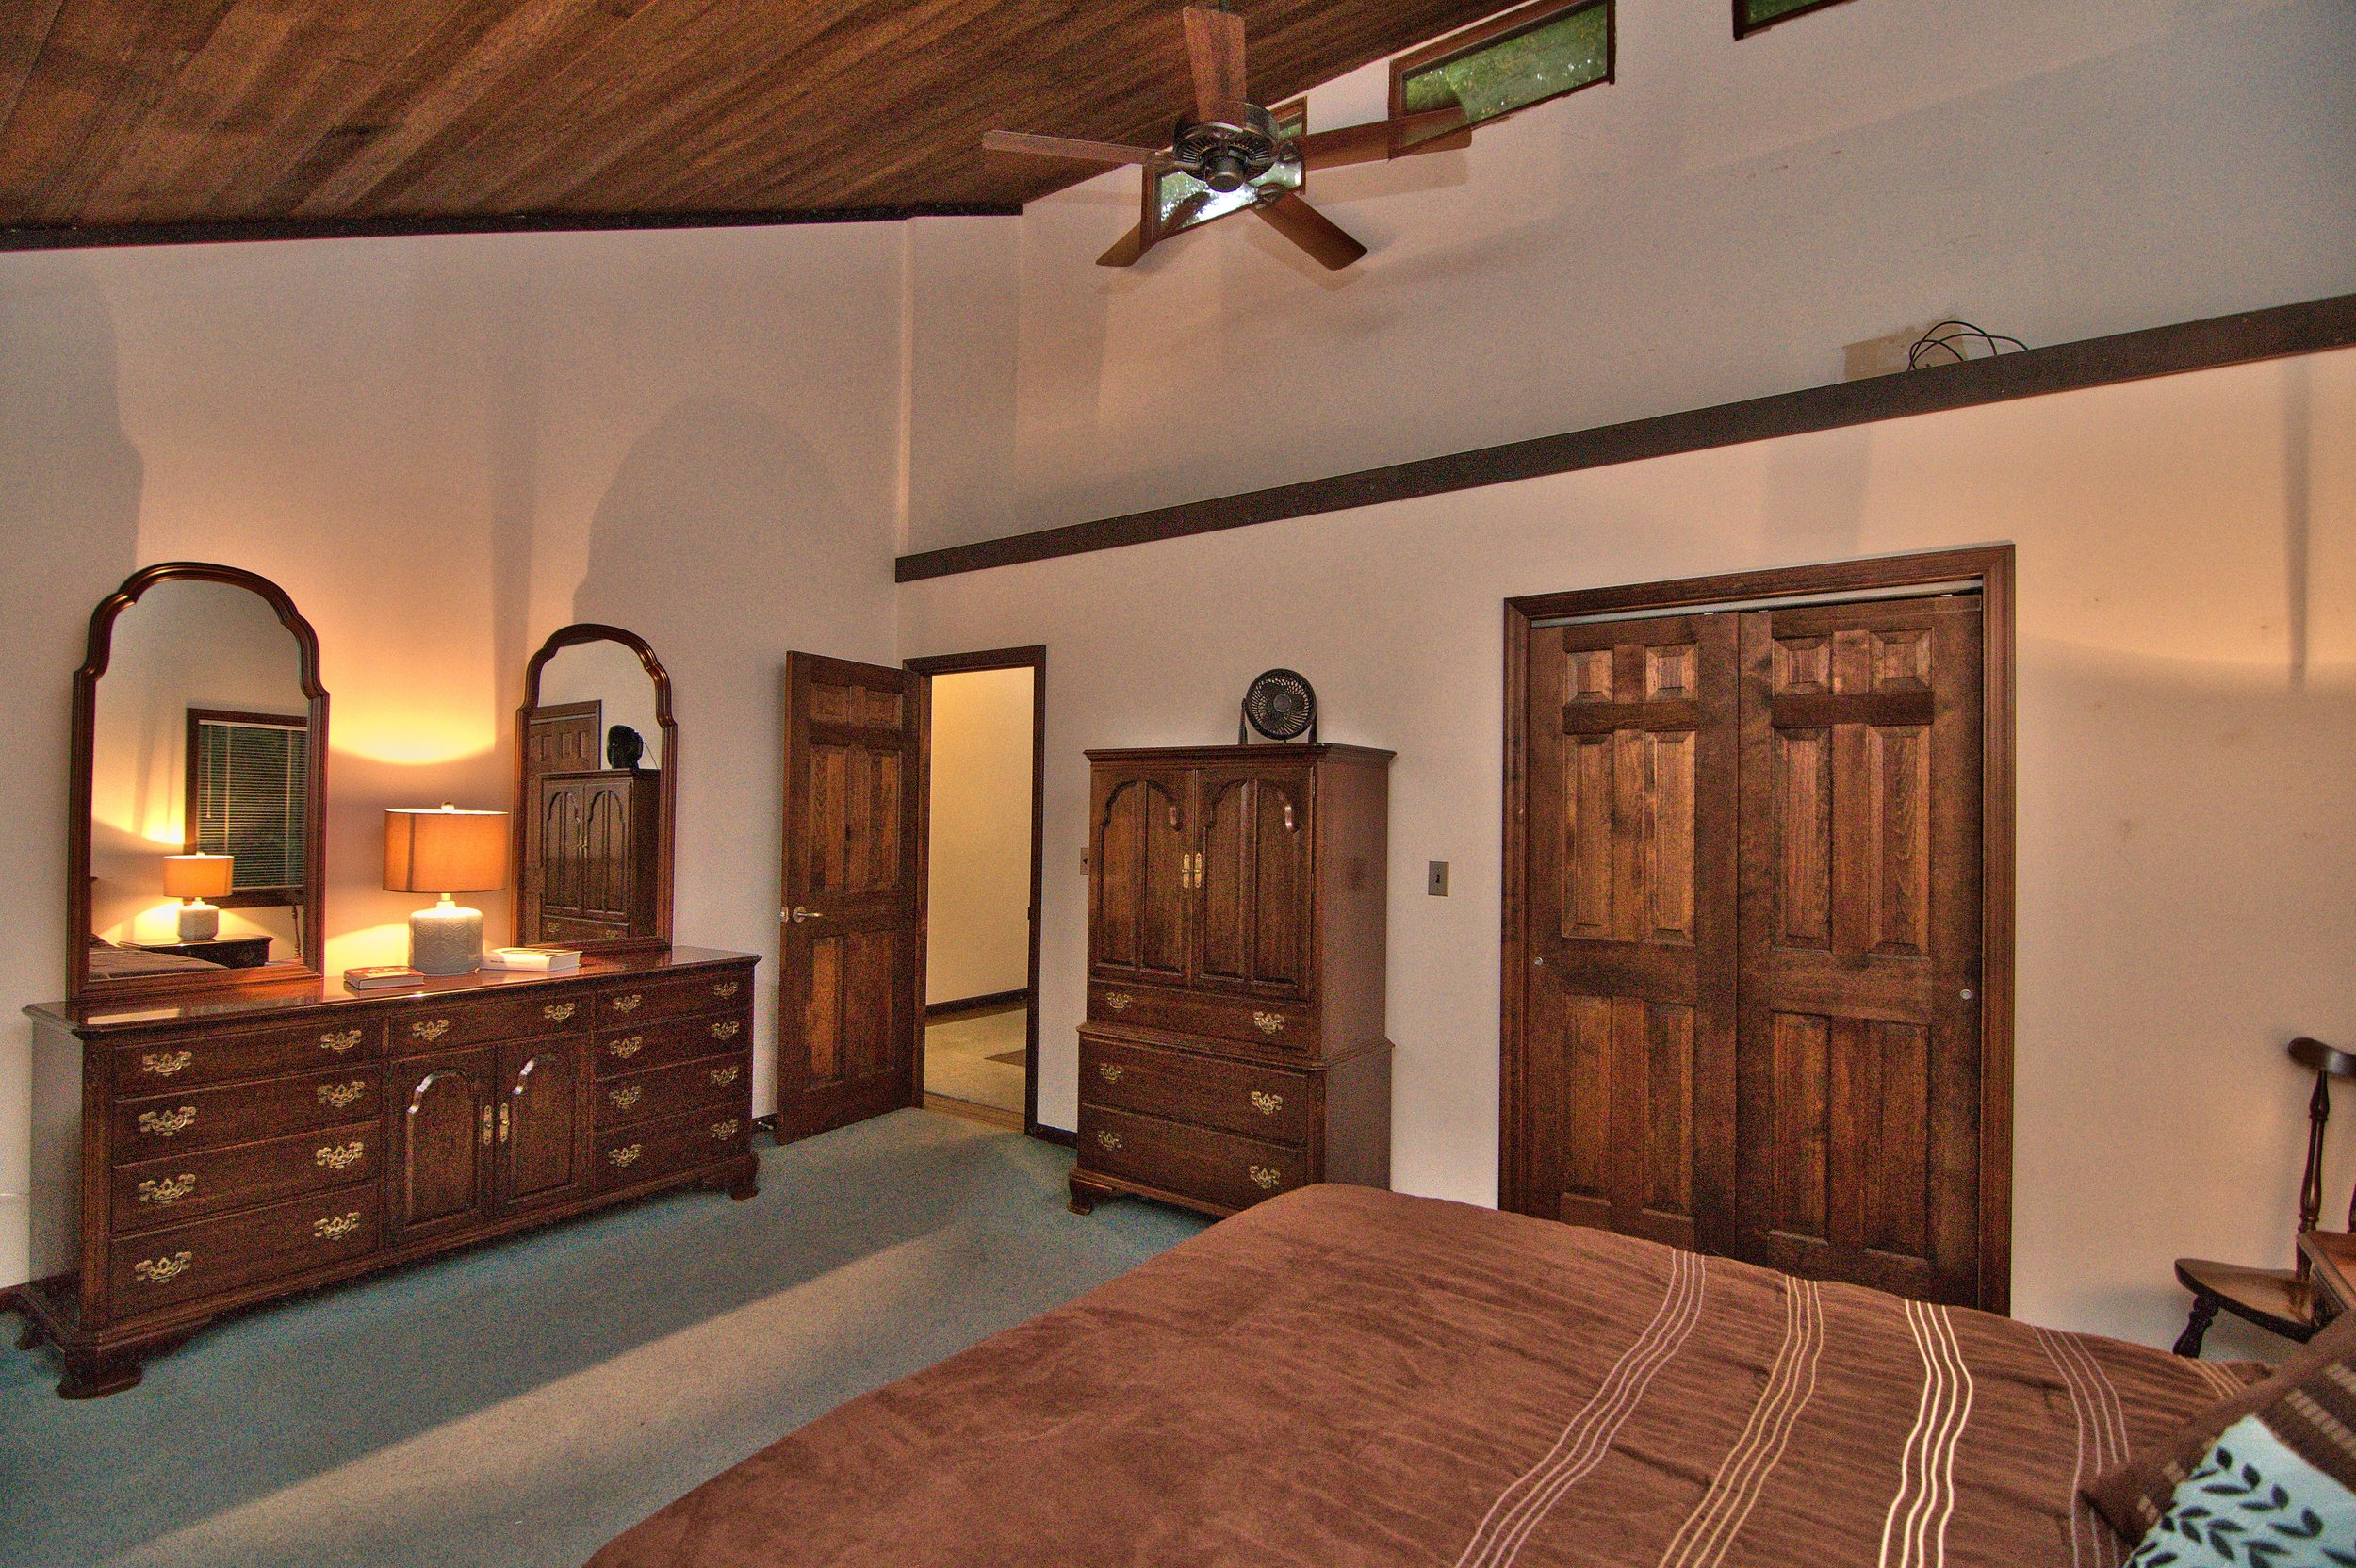 Bedroom 1 View 3.jpg